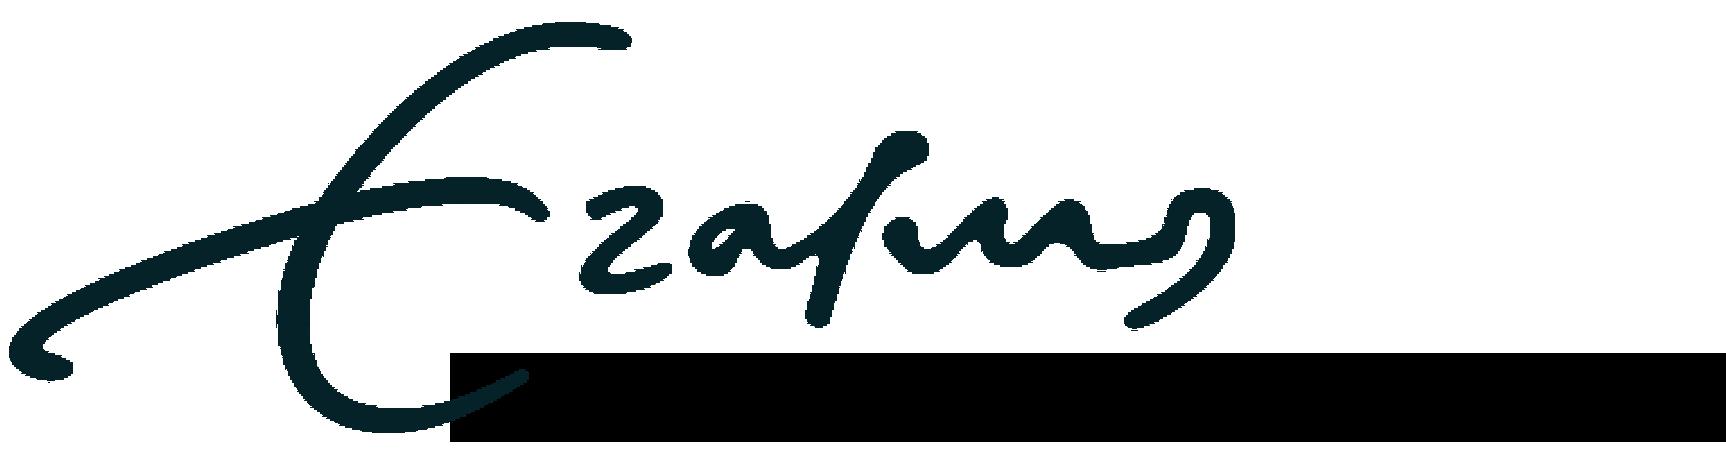 Erasmus Uni logo